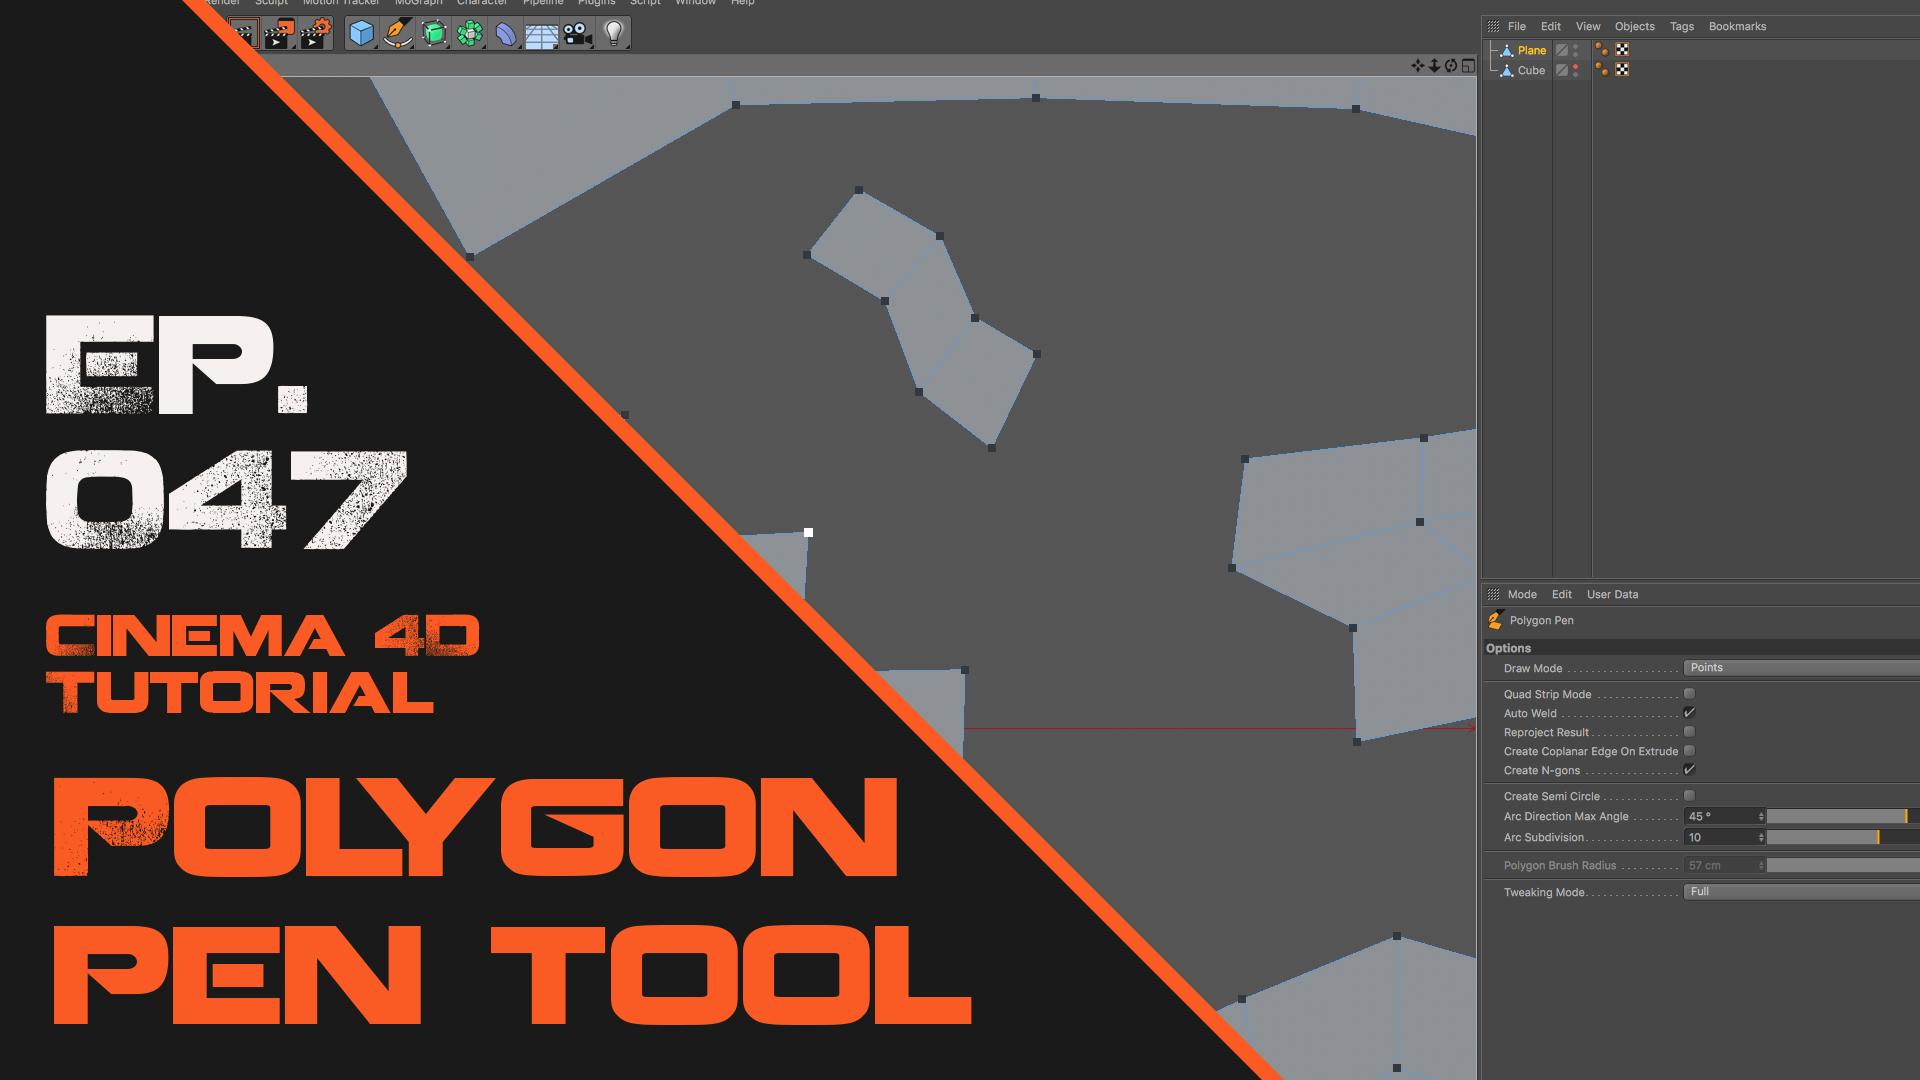 4D Max Cinema learn the polygon pen tool in cinema 4d | astronomic skills